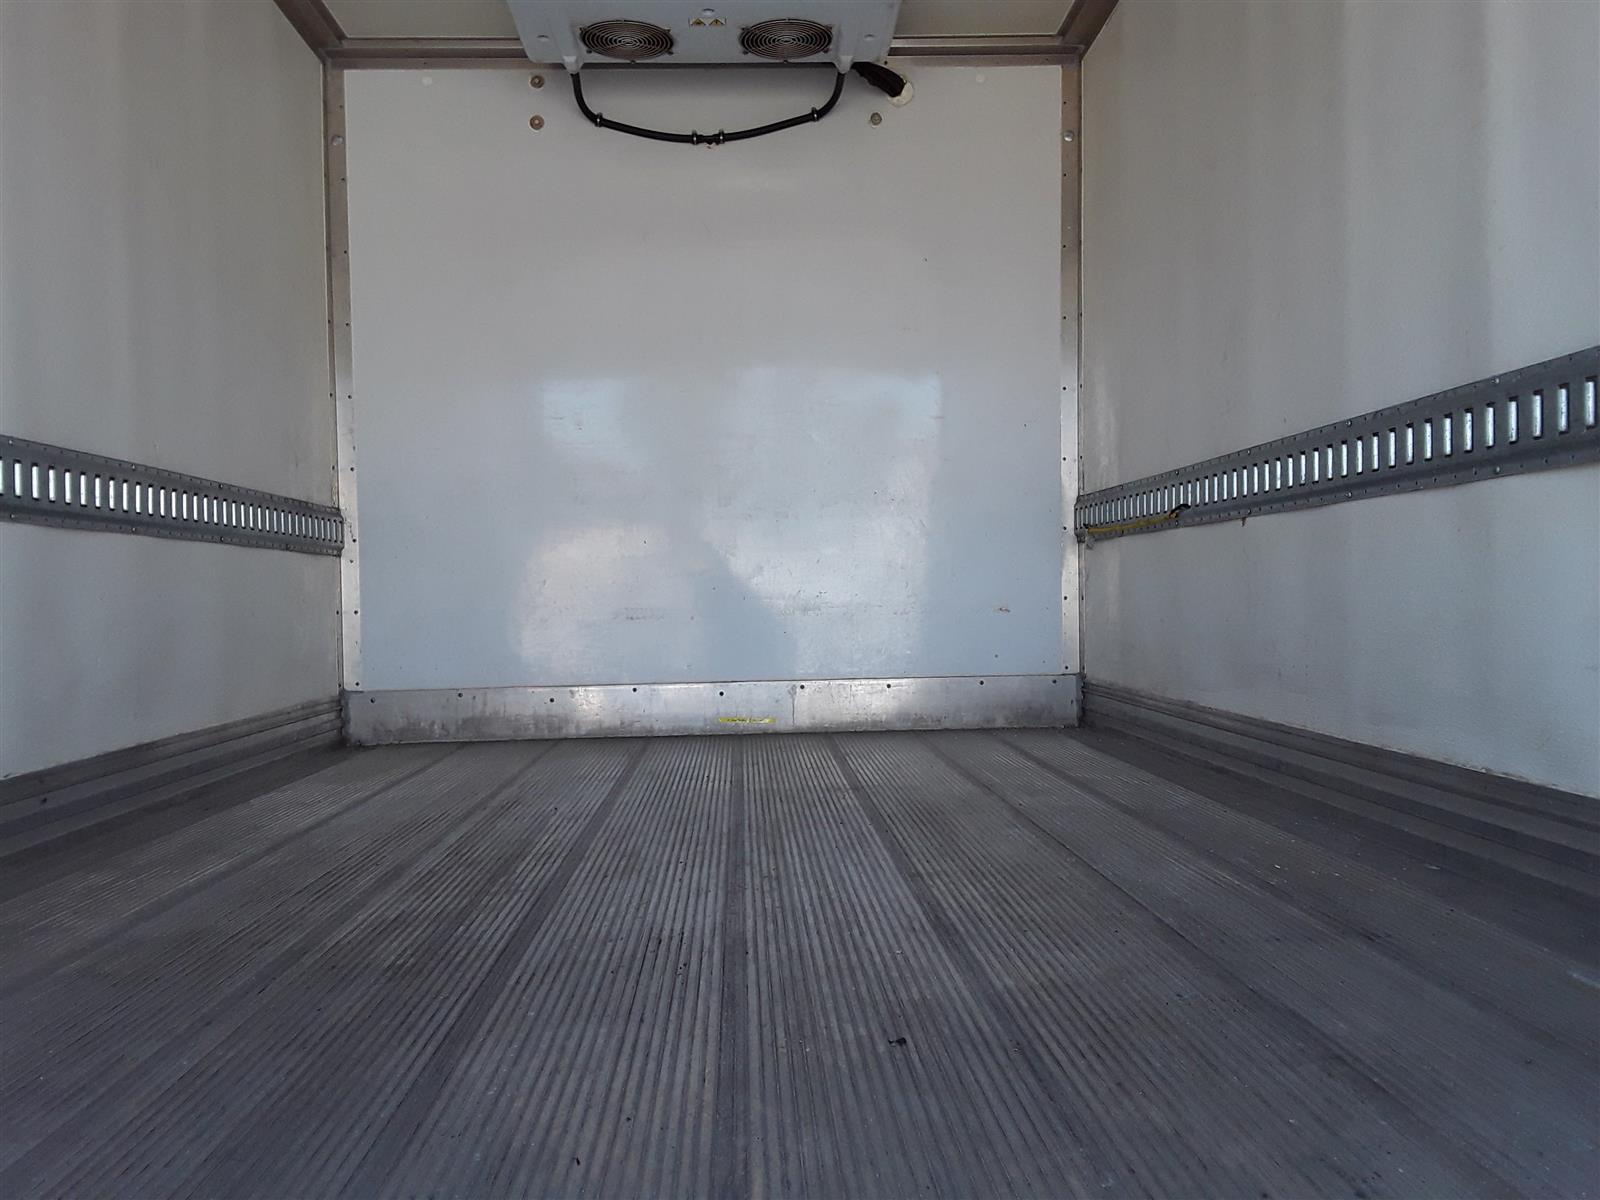 2017 Isuzu NPR Regular Cab 4x2, Refrigerated Body #752913 - photo 1